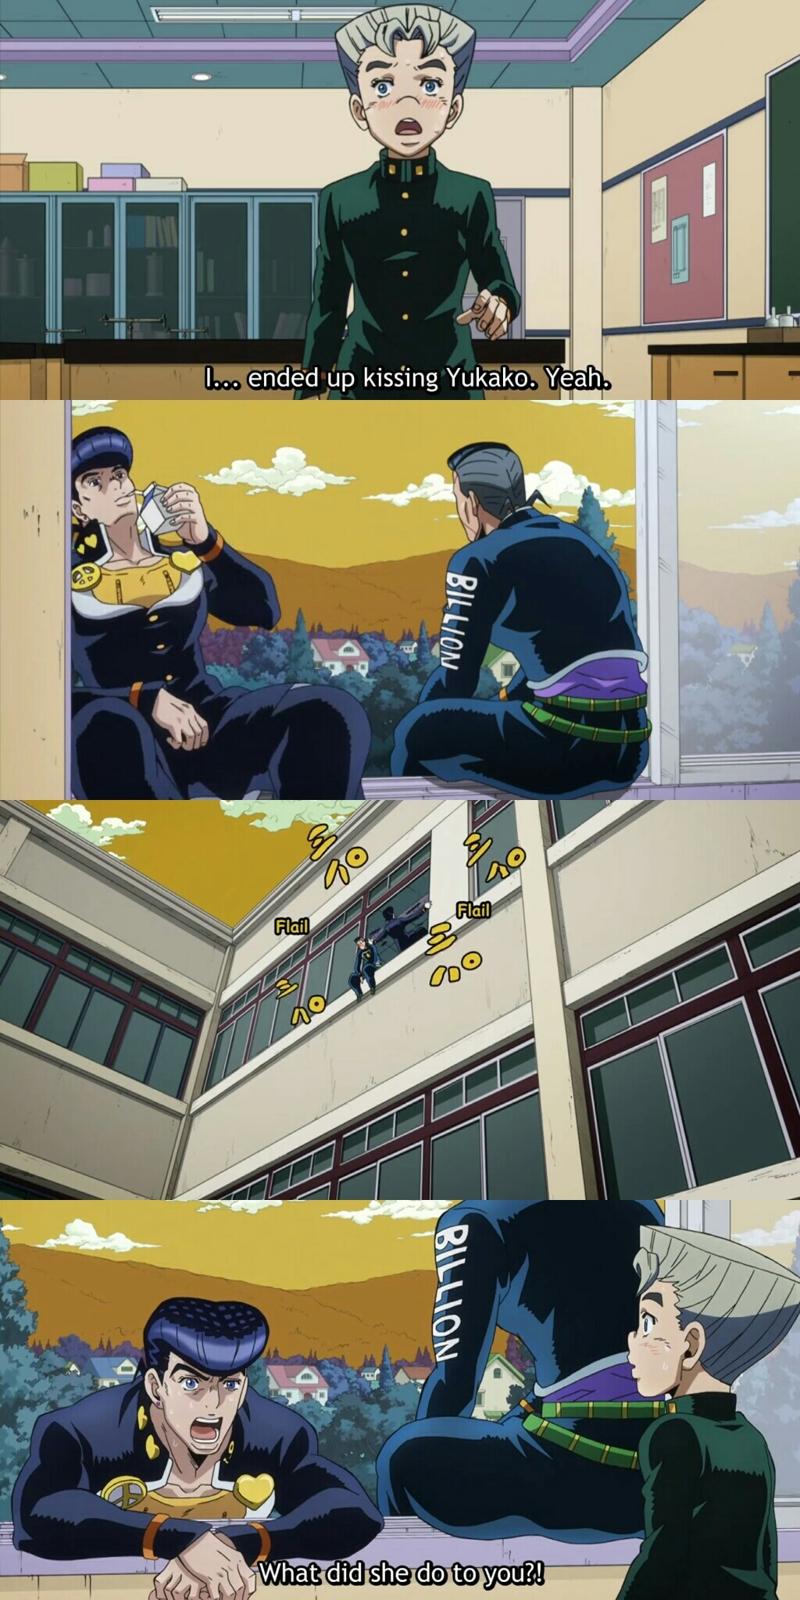 weren't we all Josuke in this episode